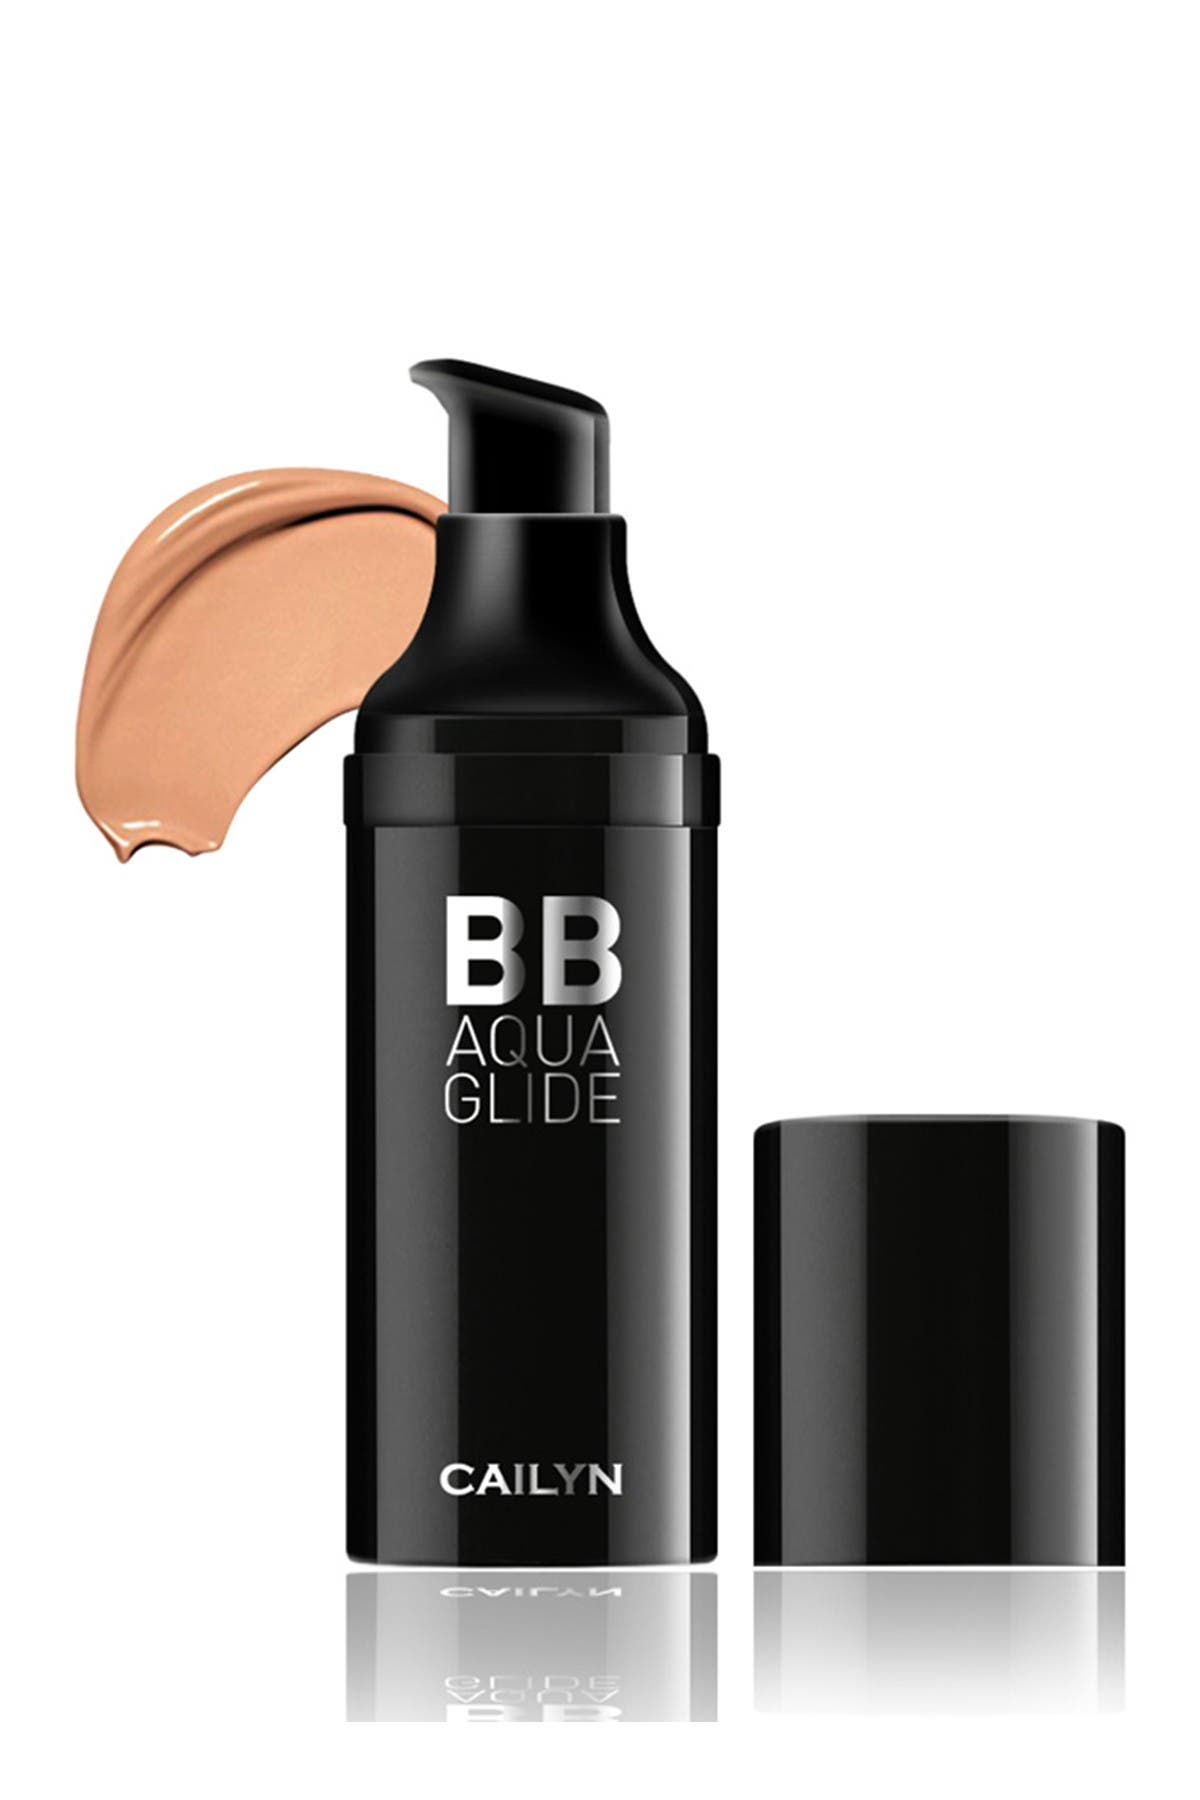 Cailyn Cosmetics Bb Aqua Glide 3-in-1 Moisturizer In Amber